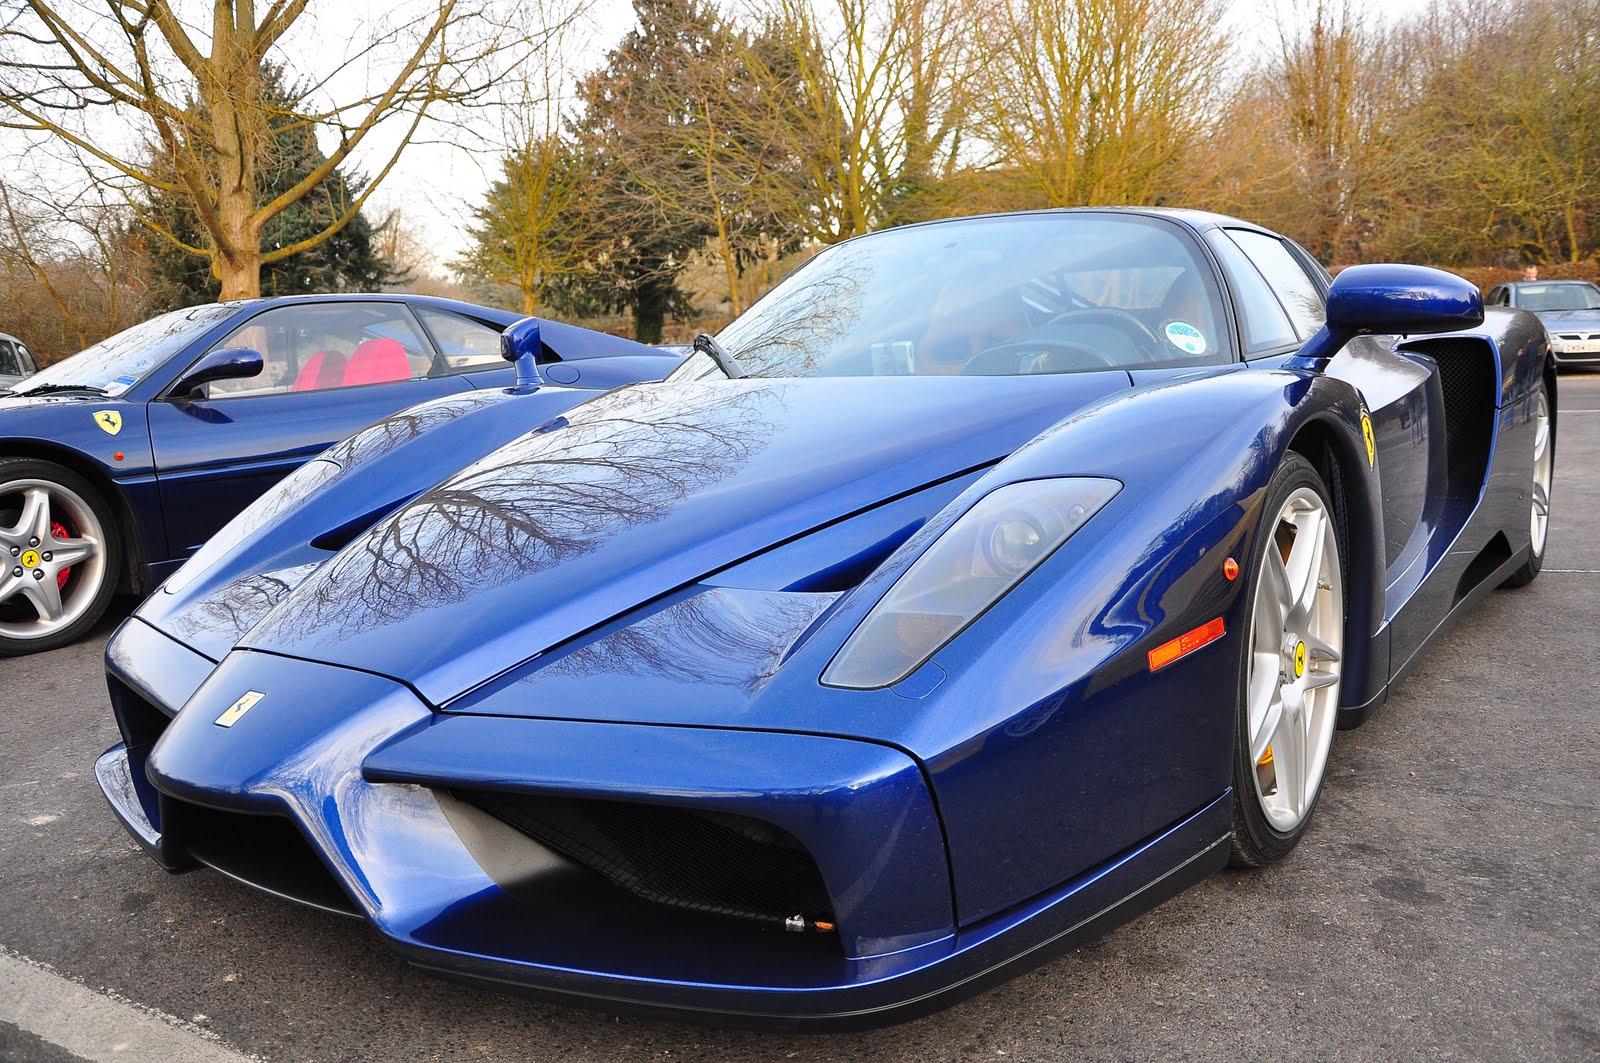 Club 4 Buzz Blue Ferrari